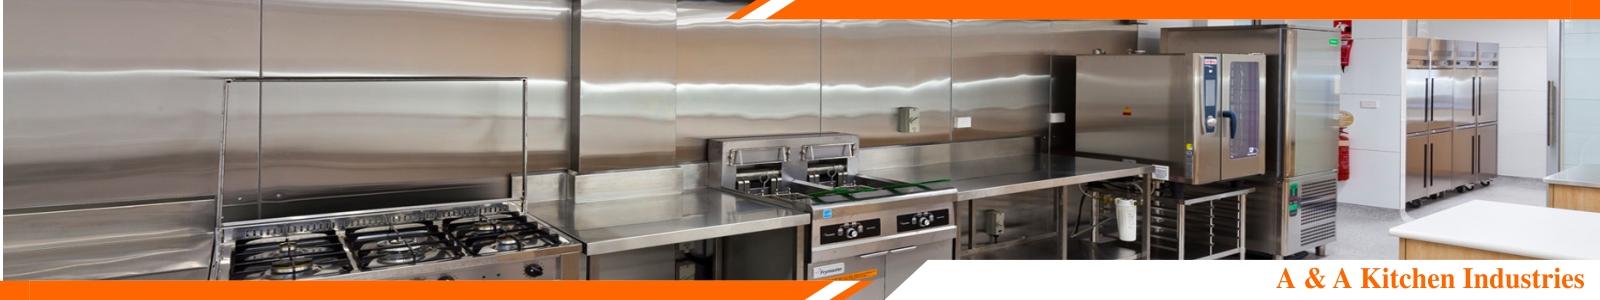 A & A kitchen Industries